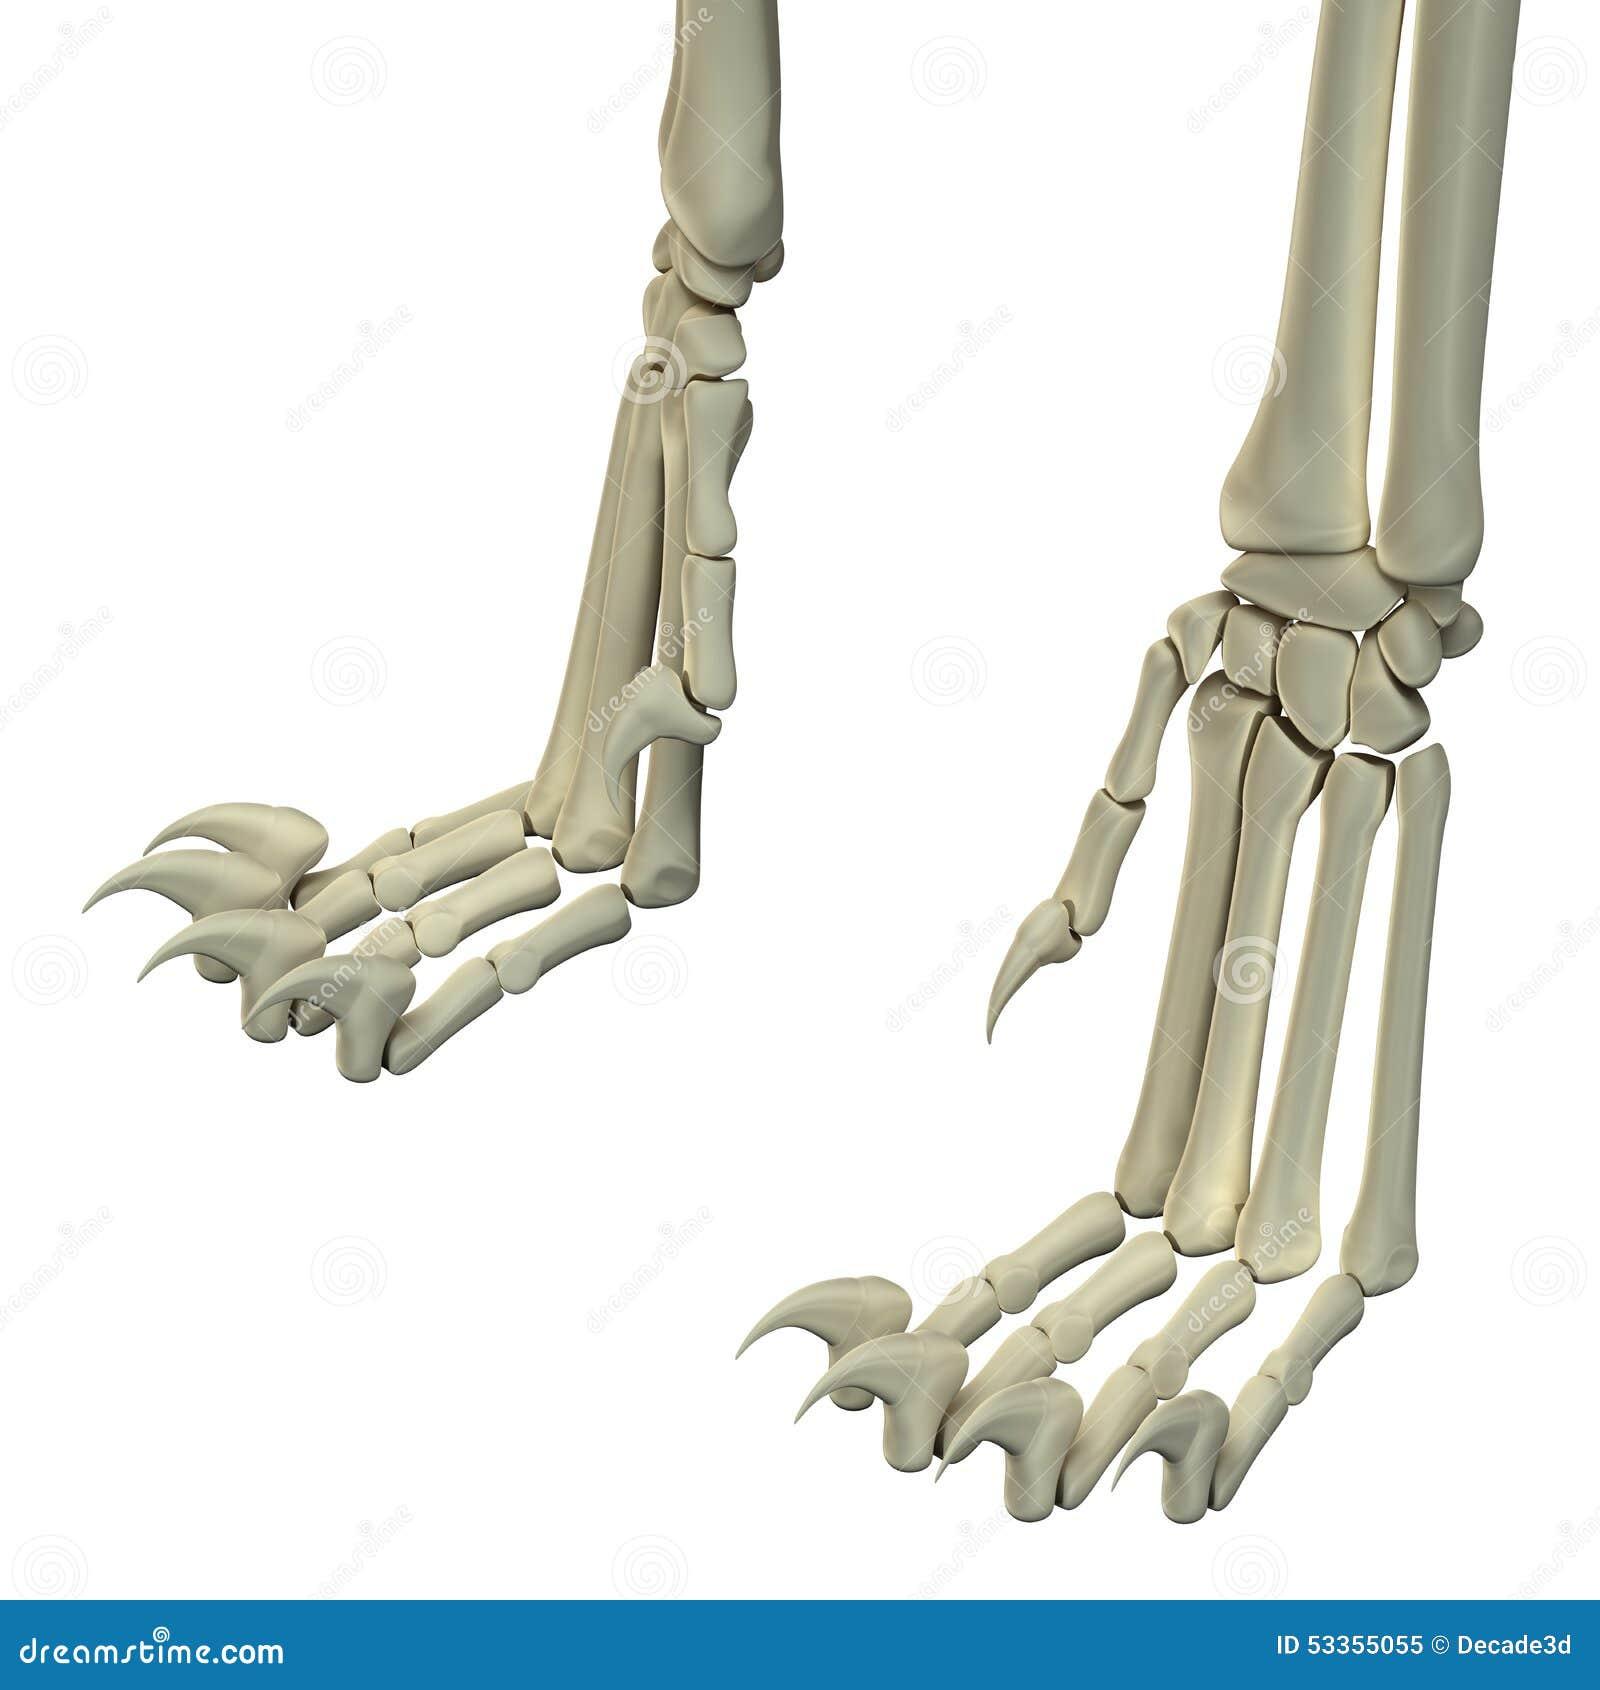 Cat Hind Legs Anatomy Bones Stock Image - Image of back, hind: 53355055